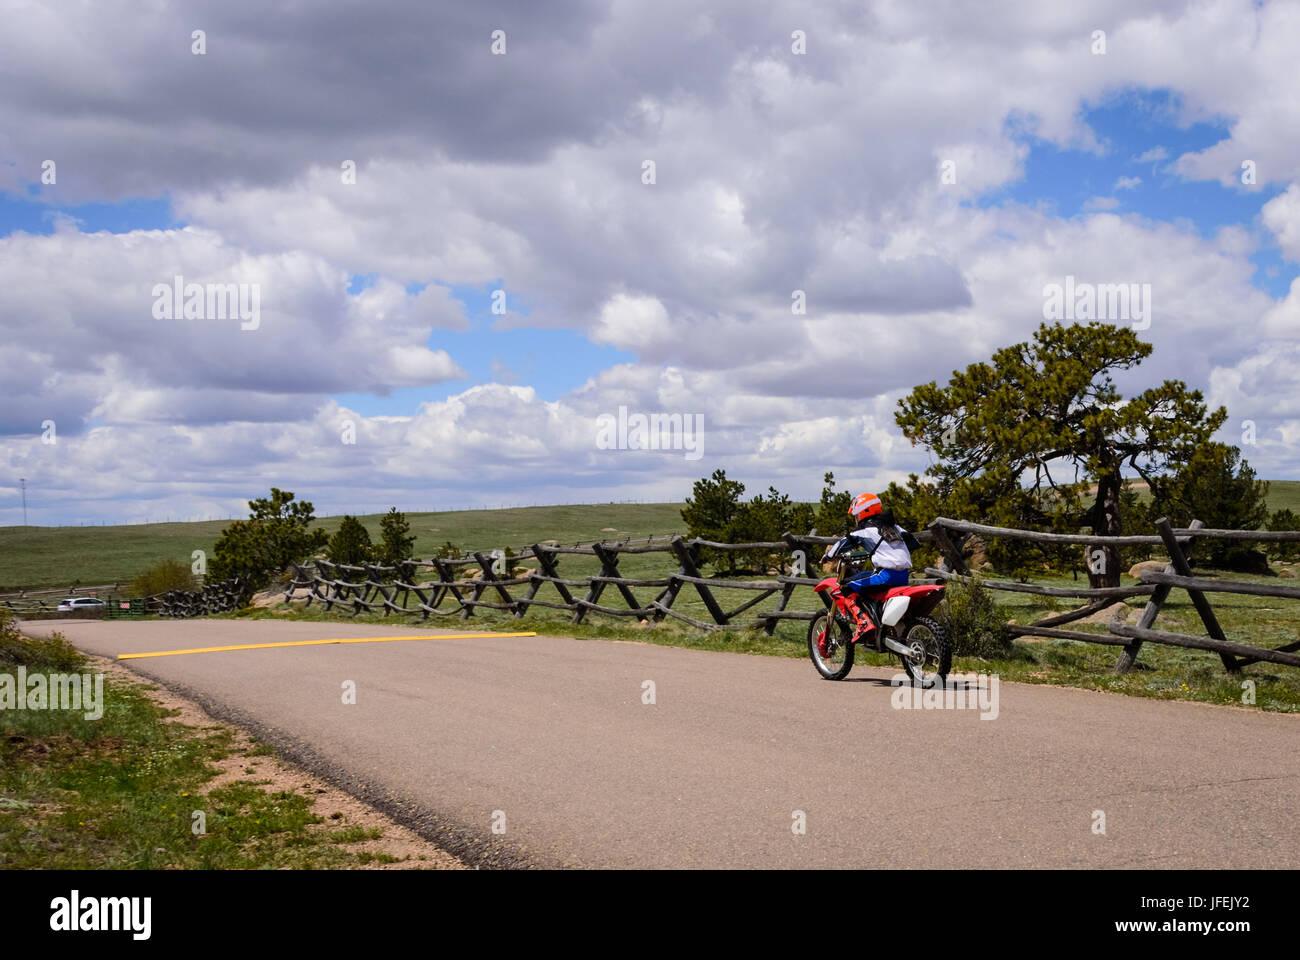 A kid, boy on a dirt bike. Motocross race, racing, USA - Stock Image